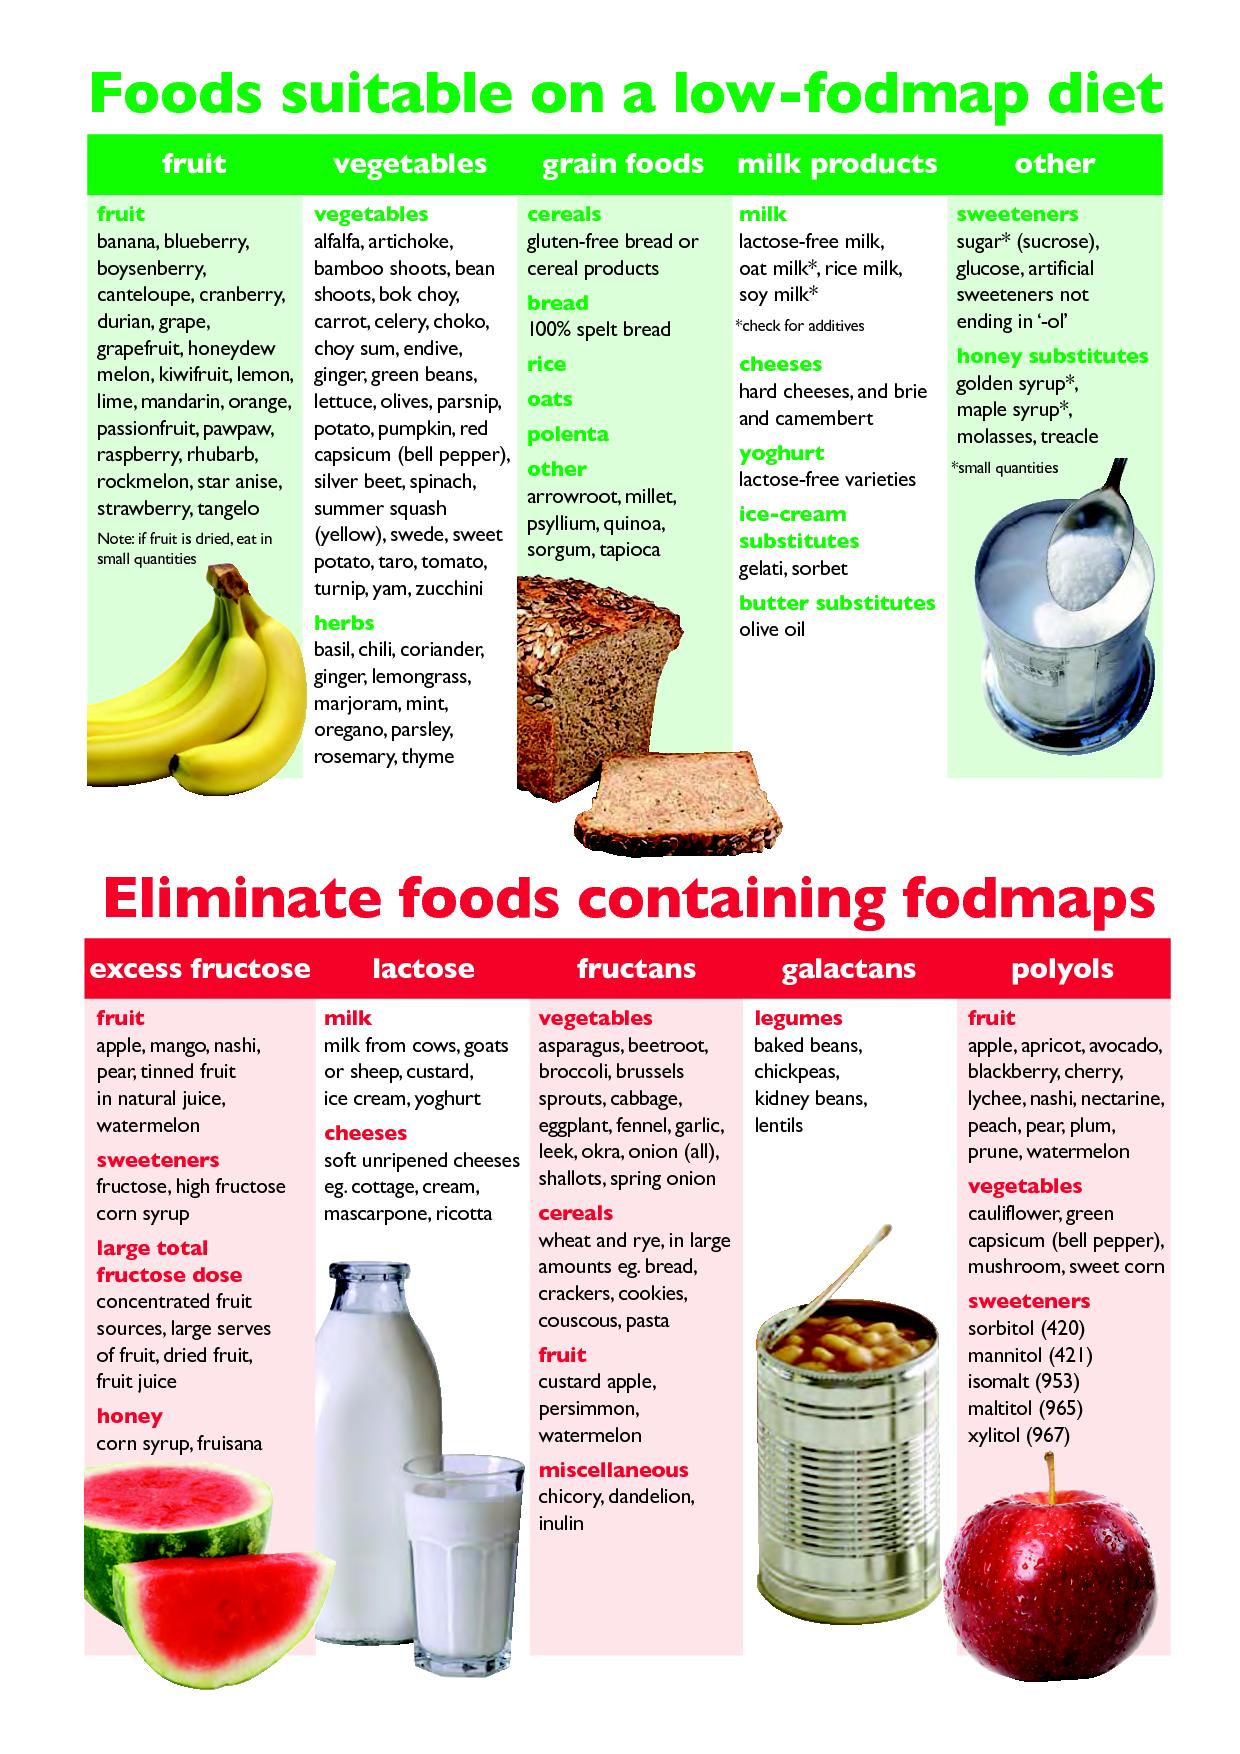 Foods High In Oligosaccharides